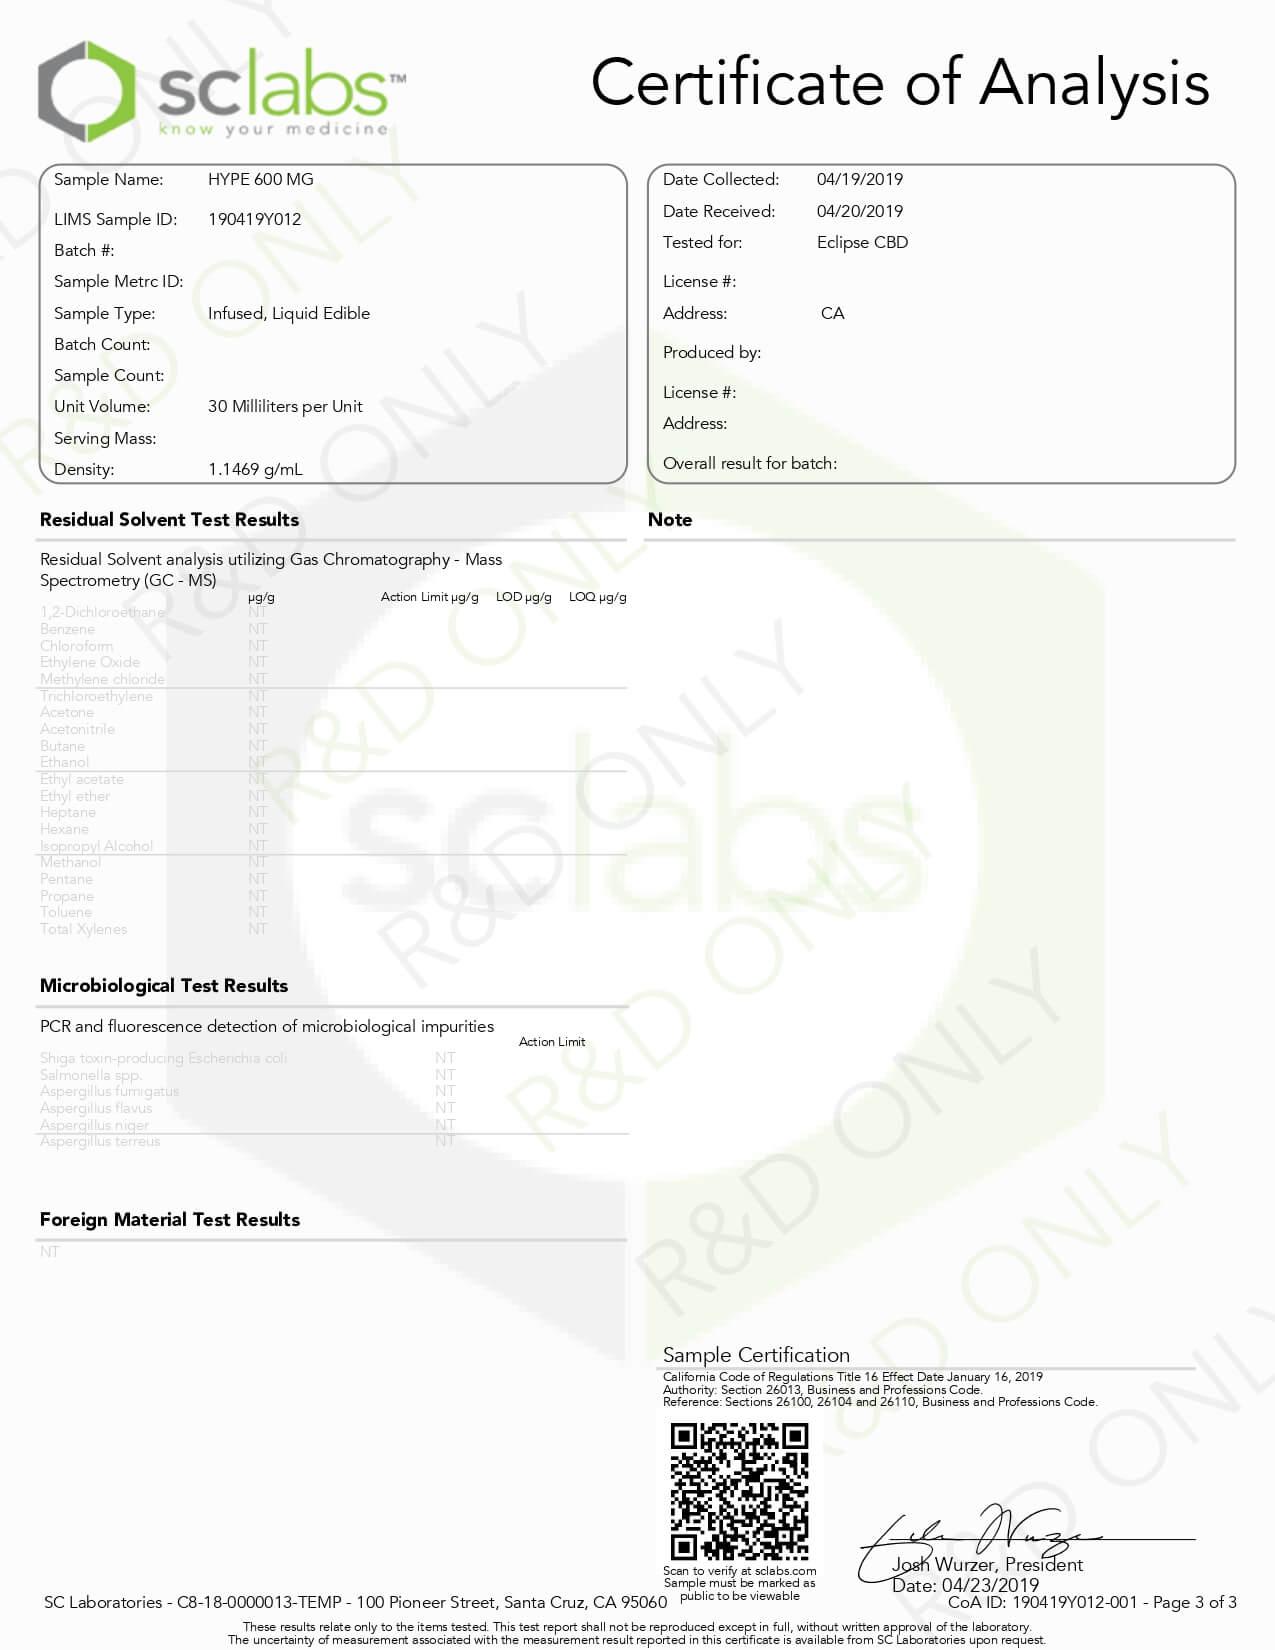 Eclipse CBD Vape Juice Hype 600mg Lab Report